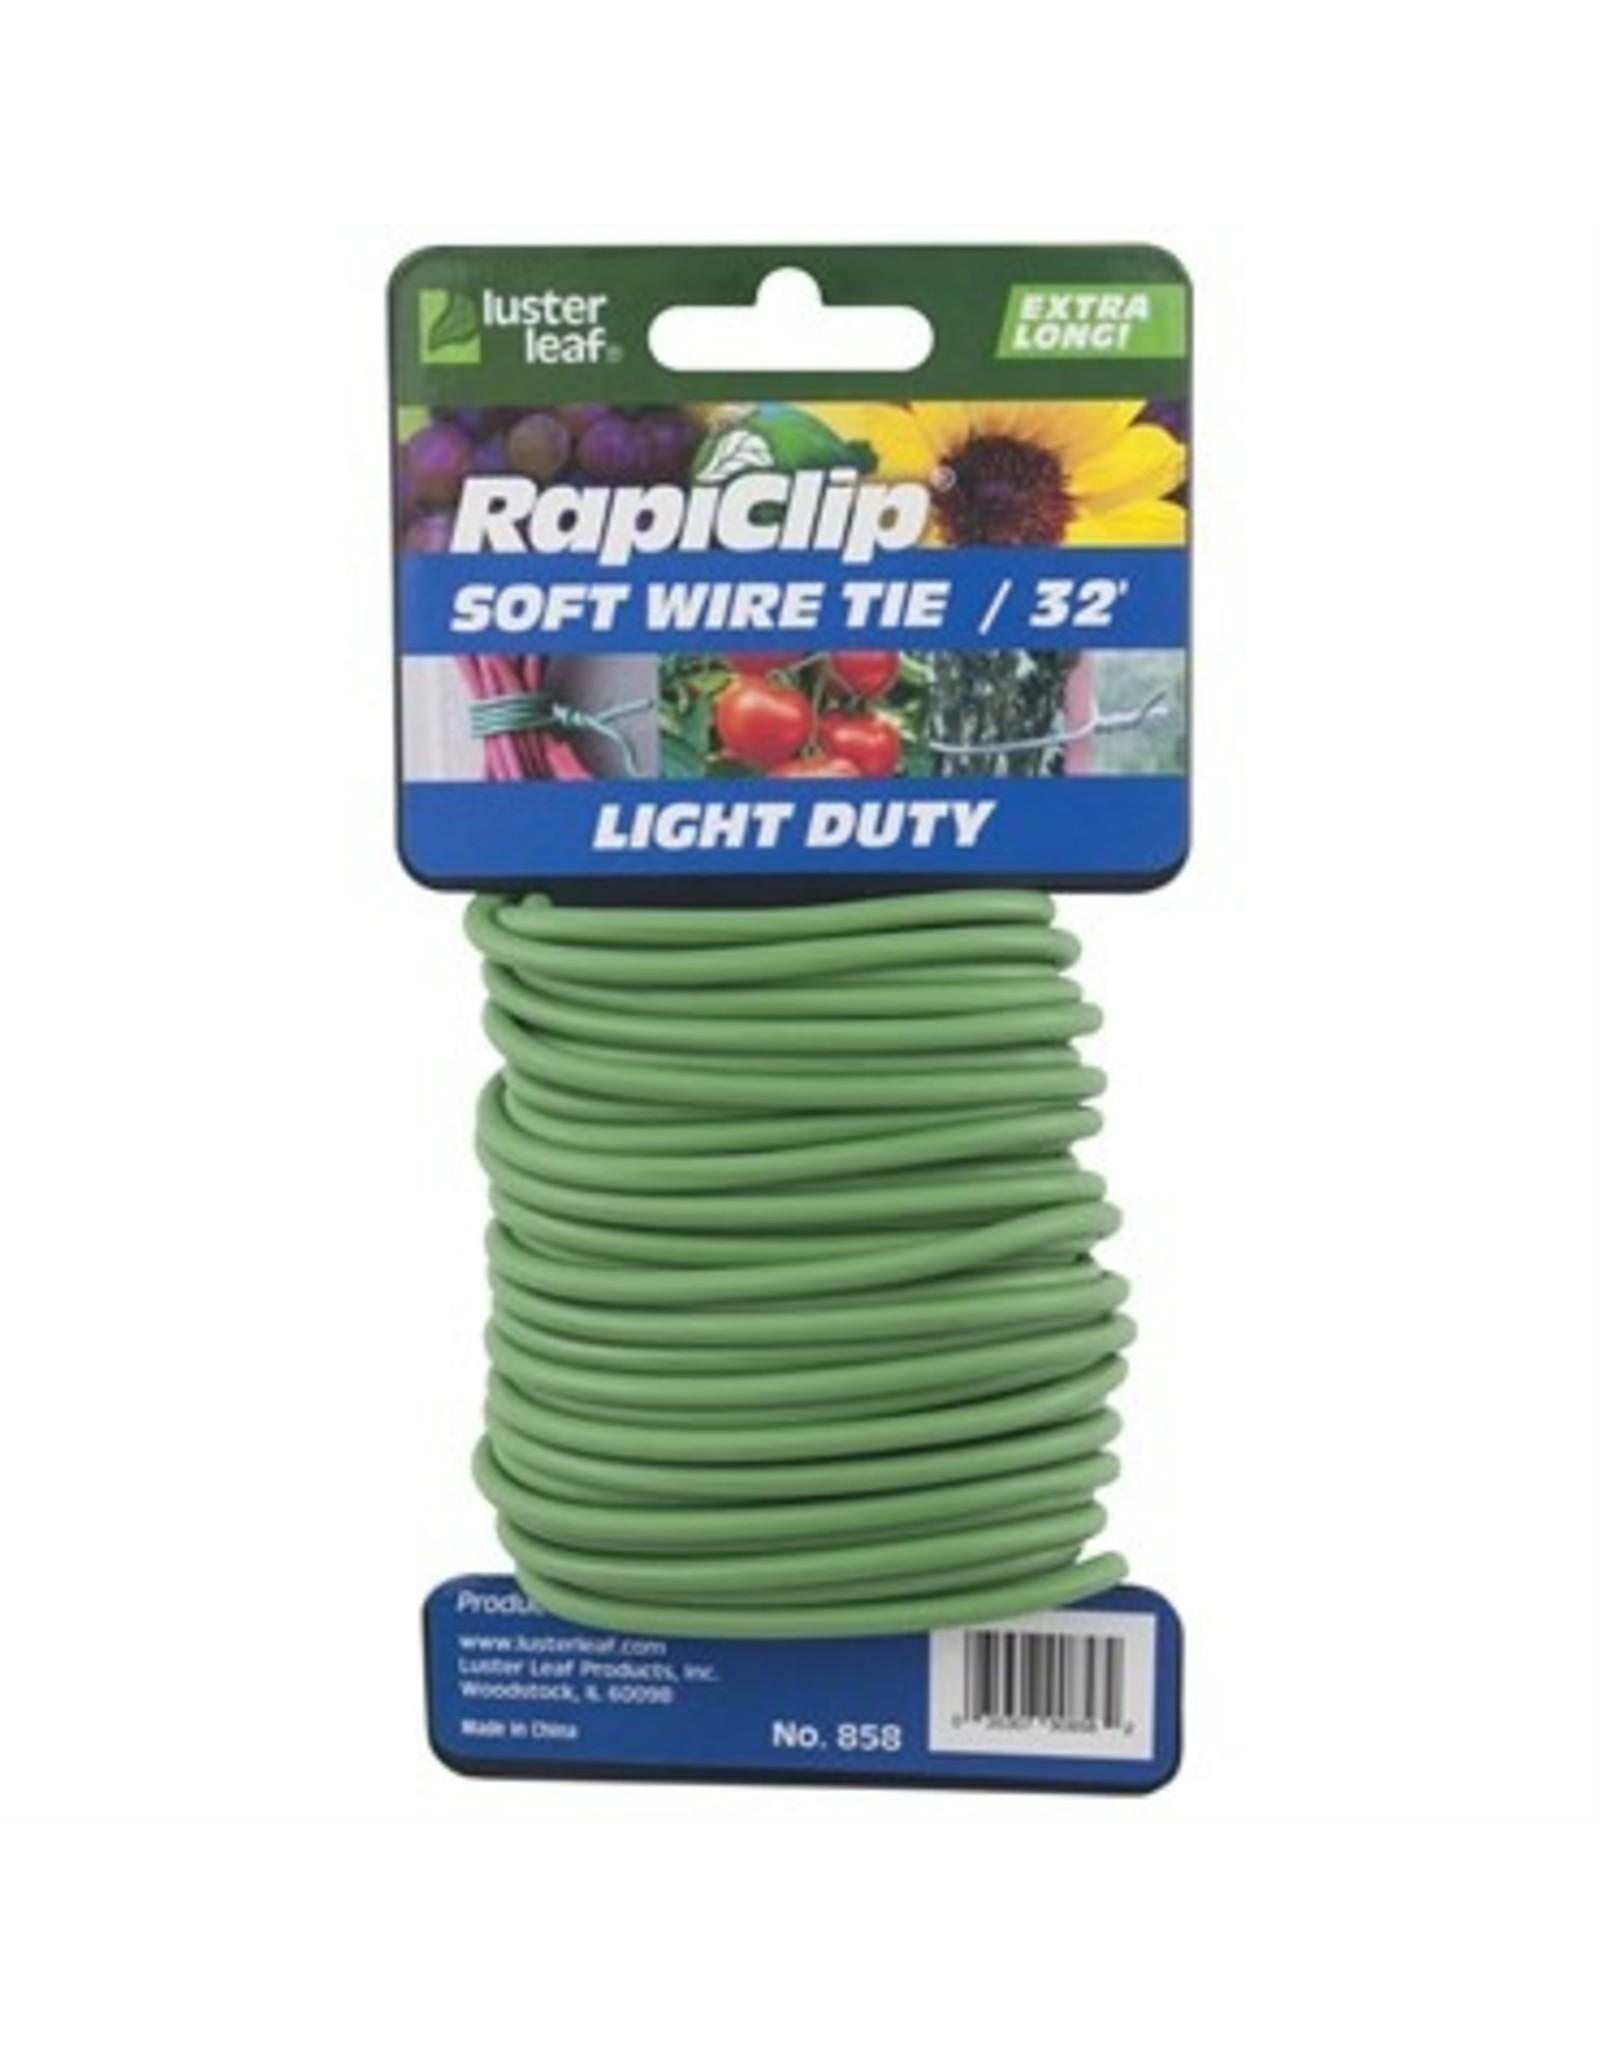 Light Duty Soft Twist Tie Wire - 32'